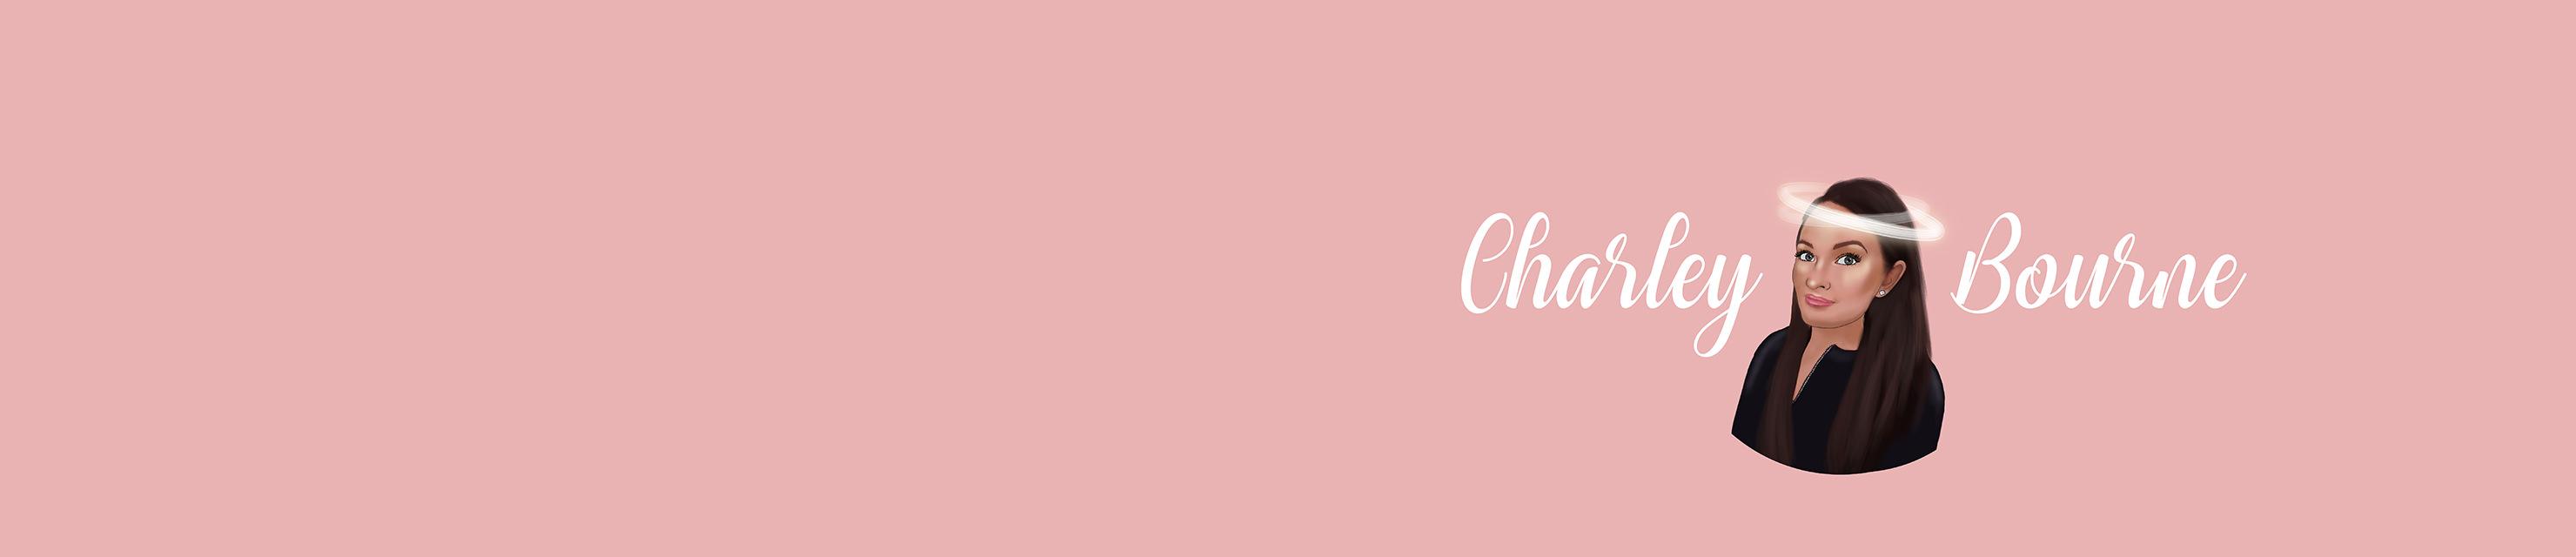 CHARLEY BOURNE Hero Banner